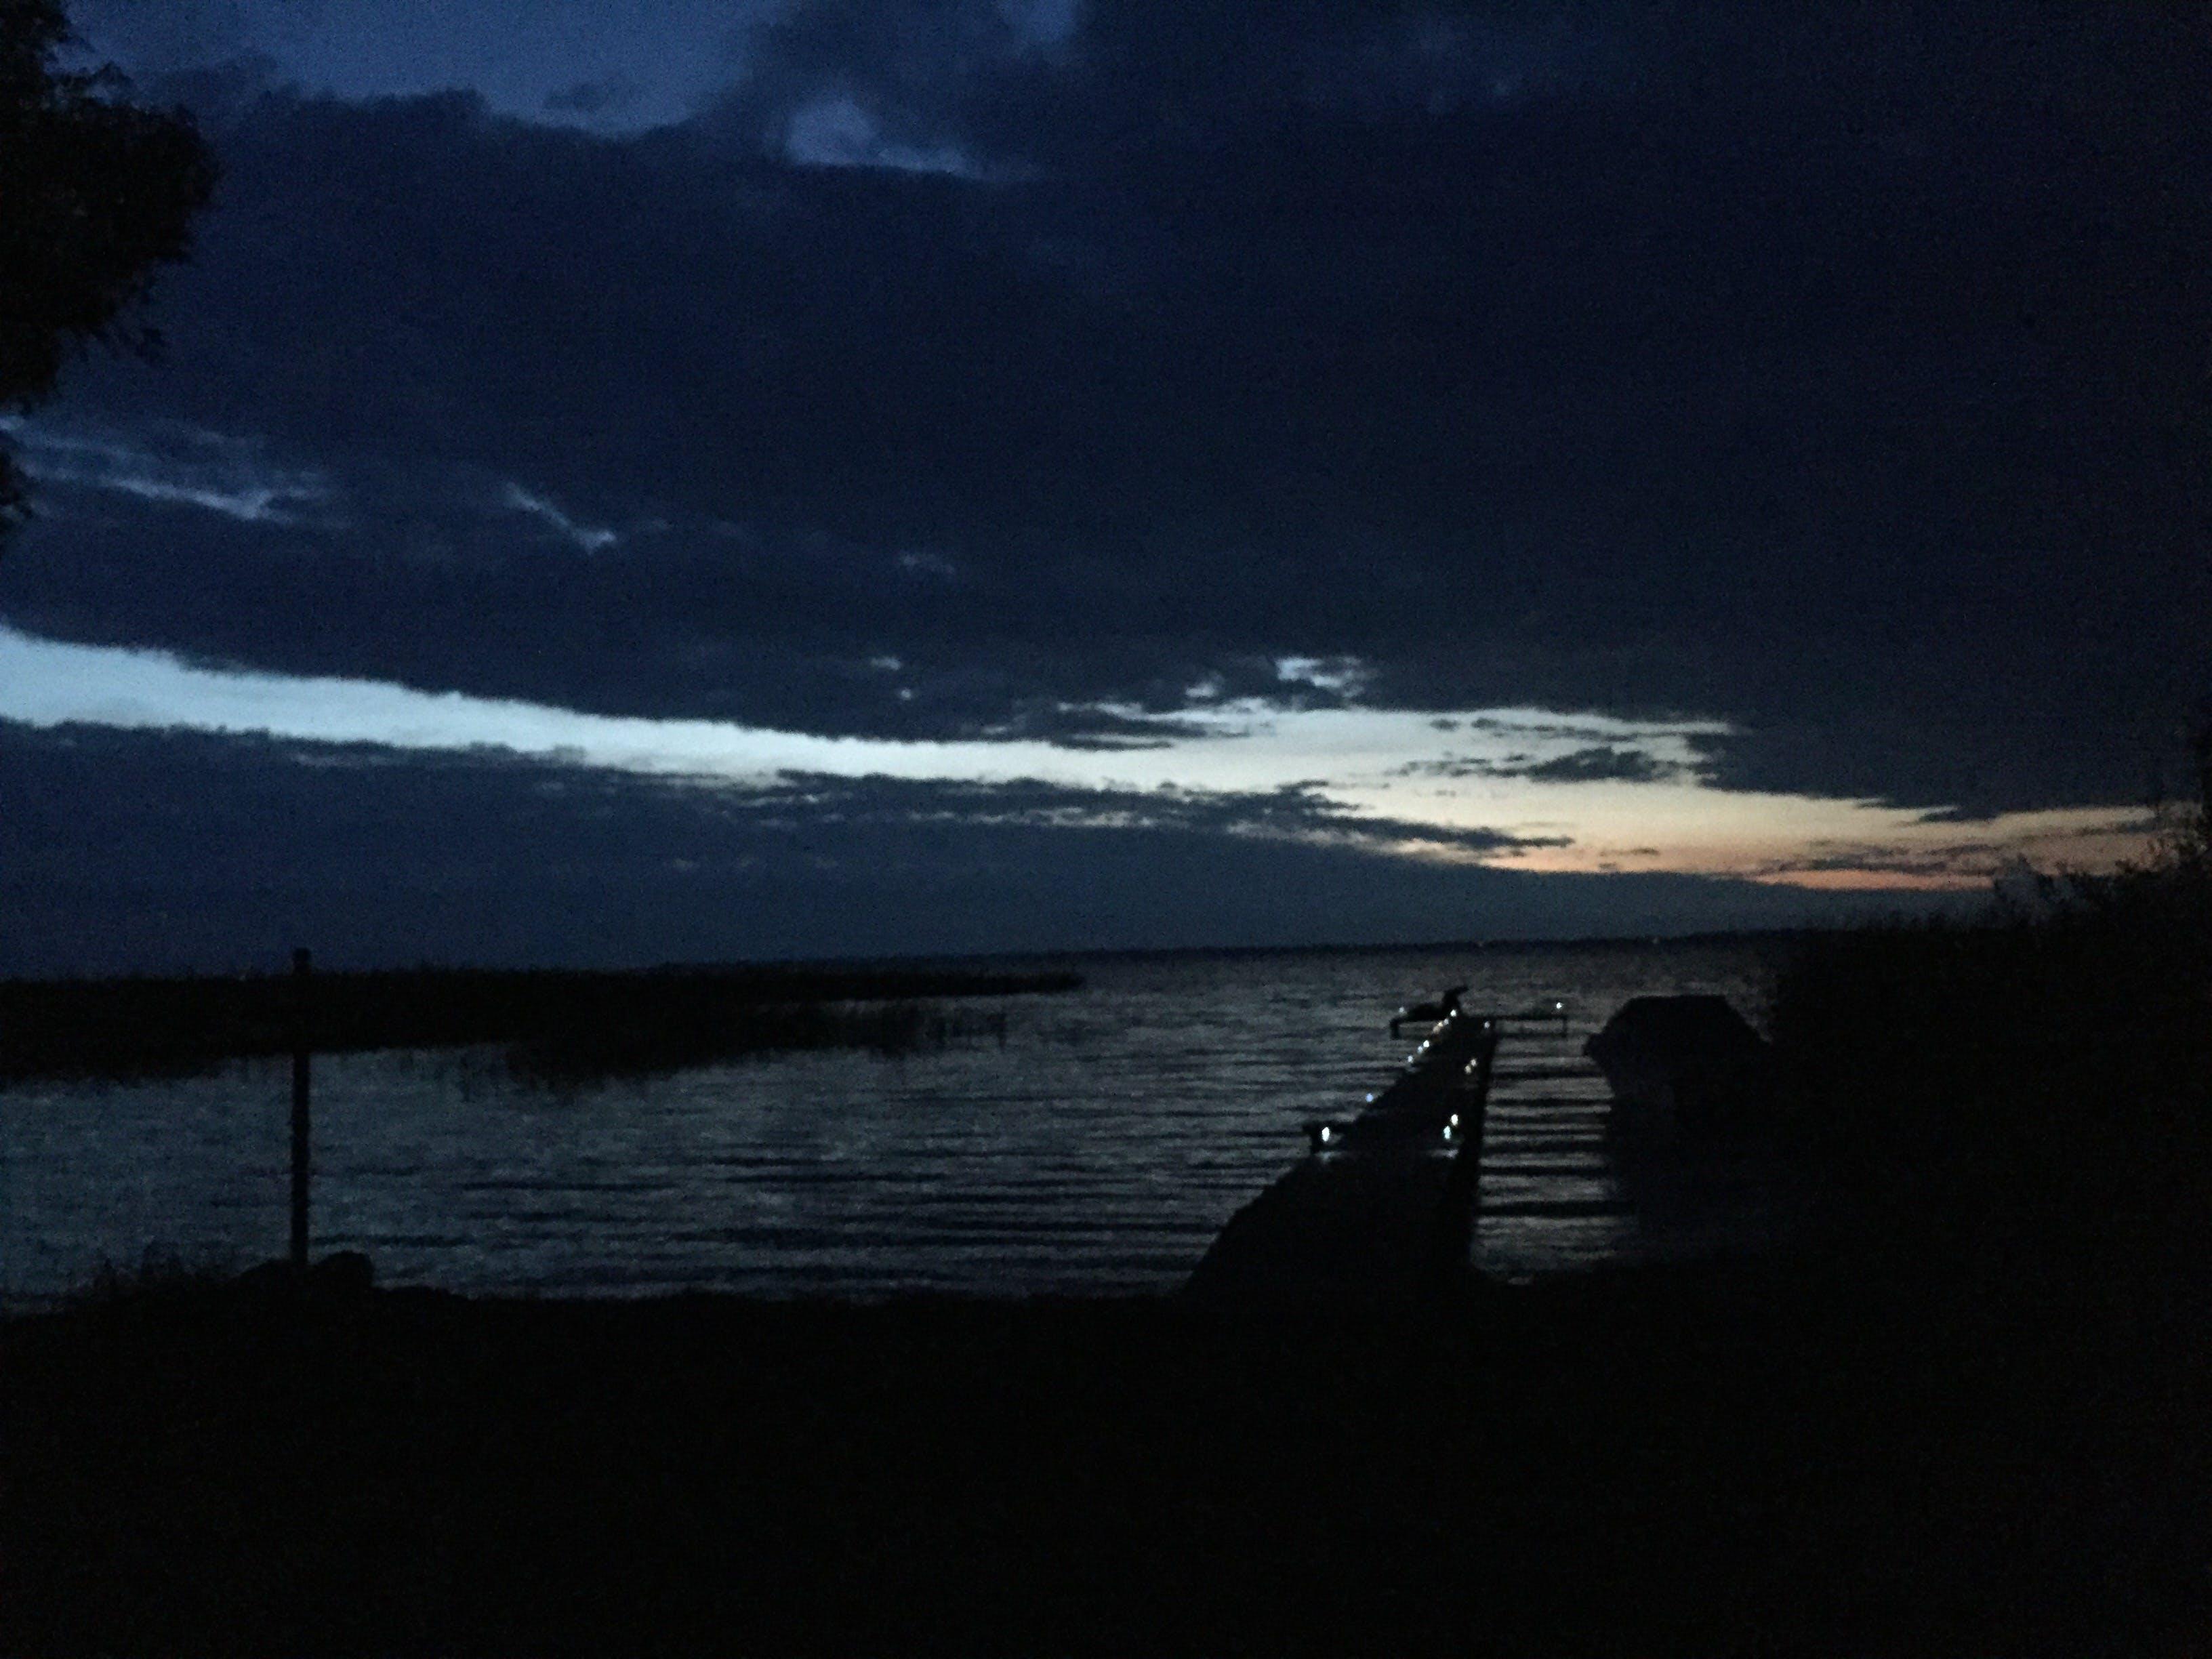 Free stock photo of evening, evening sky, lake, sunset